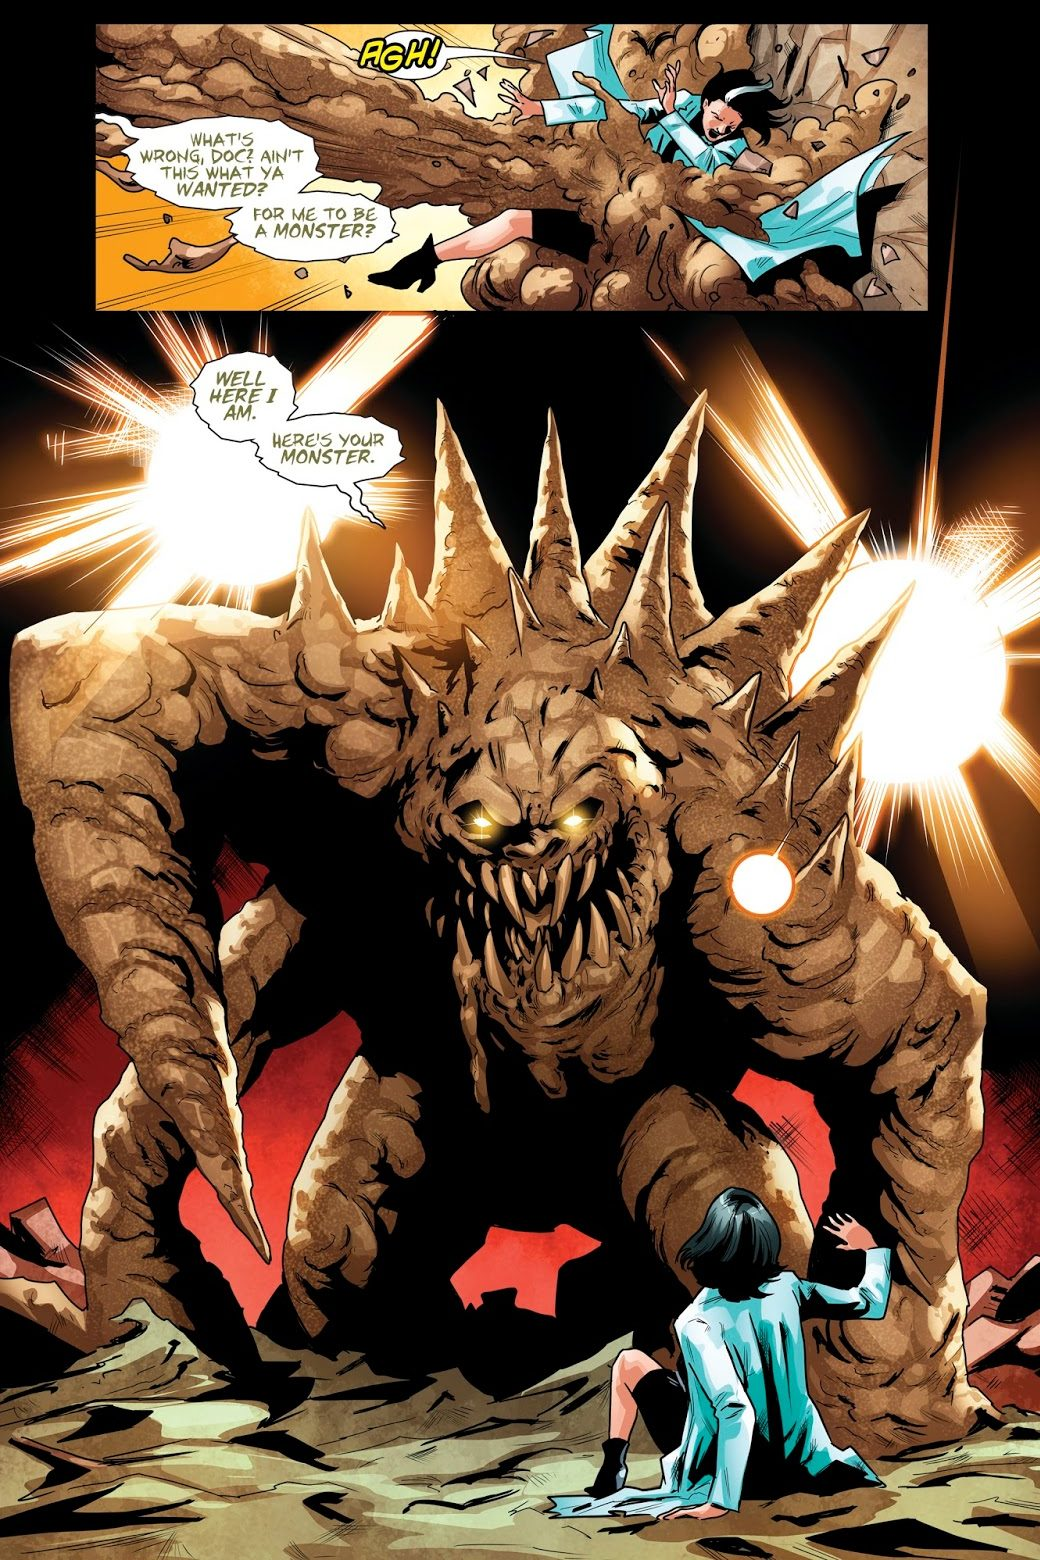 Clayface (Detective Comics #964)